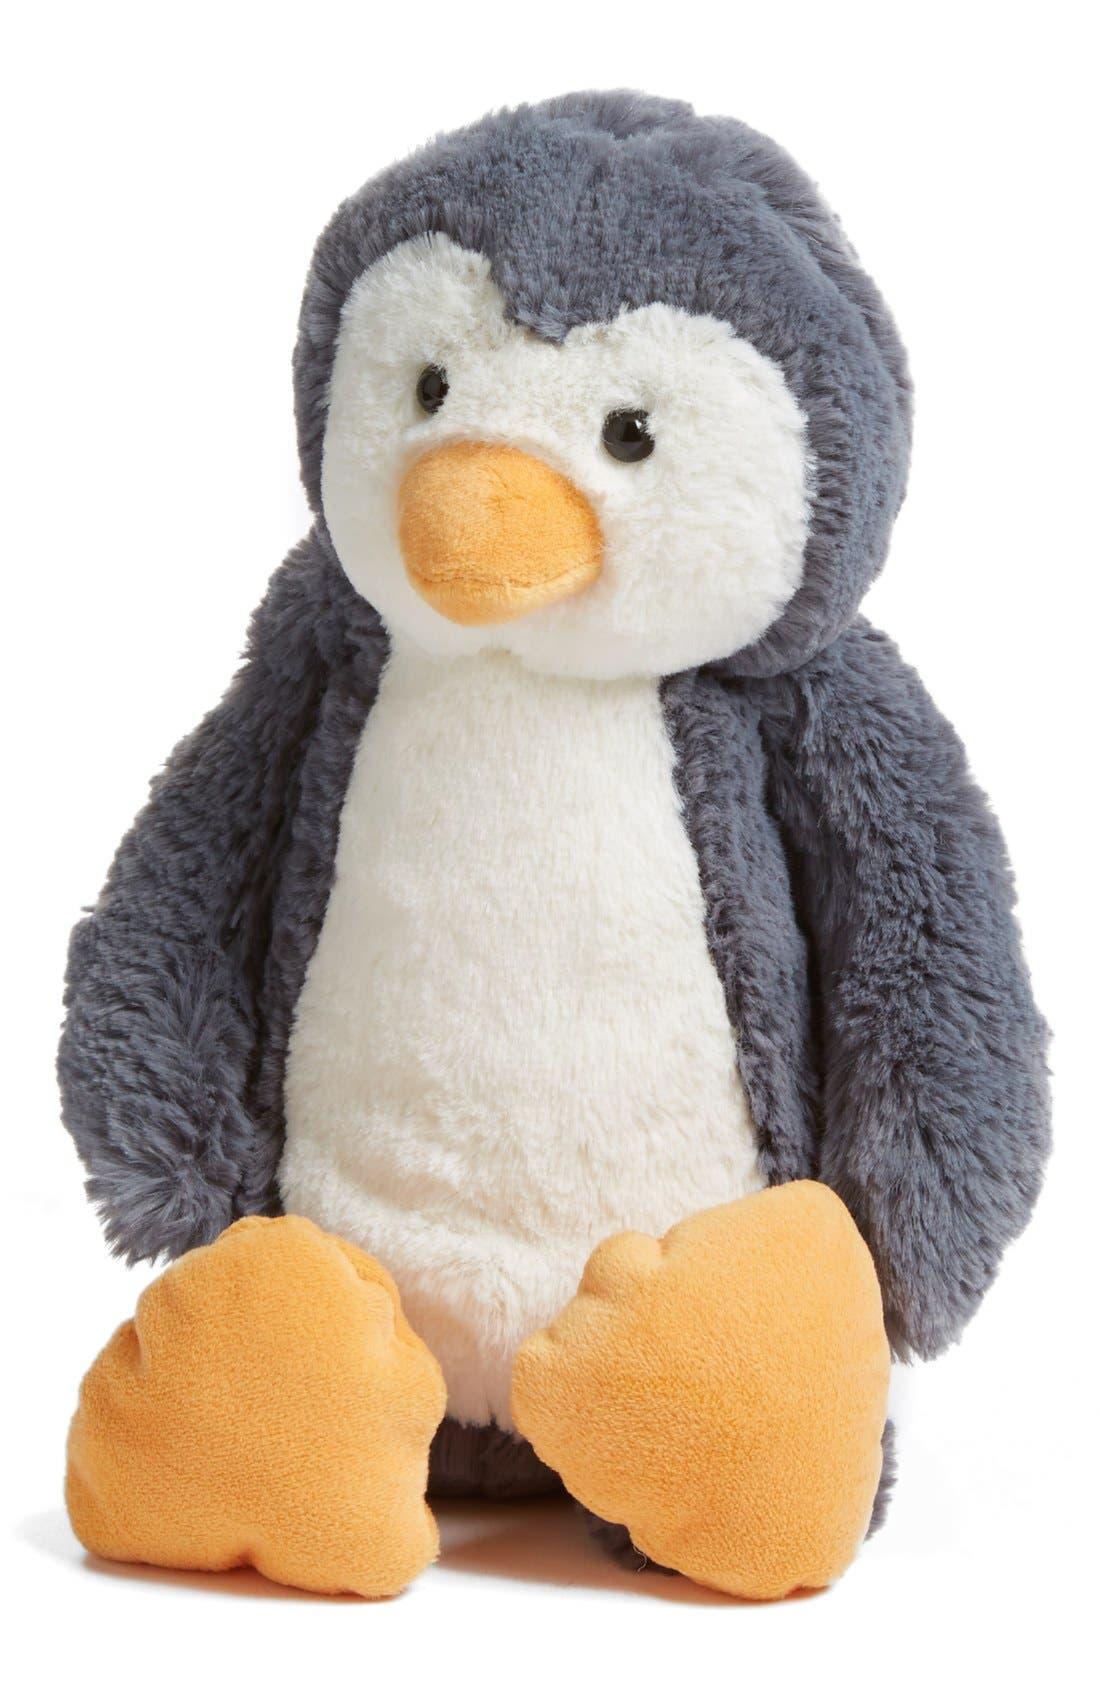 Main Image - Jellycat 'Bashful Penguin' Stuffed Animal